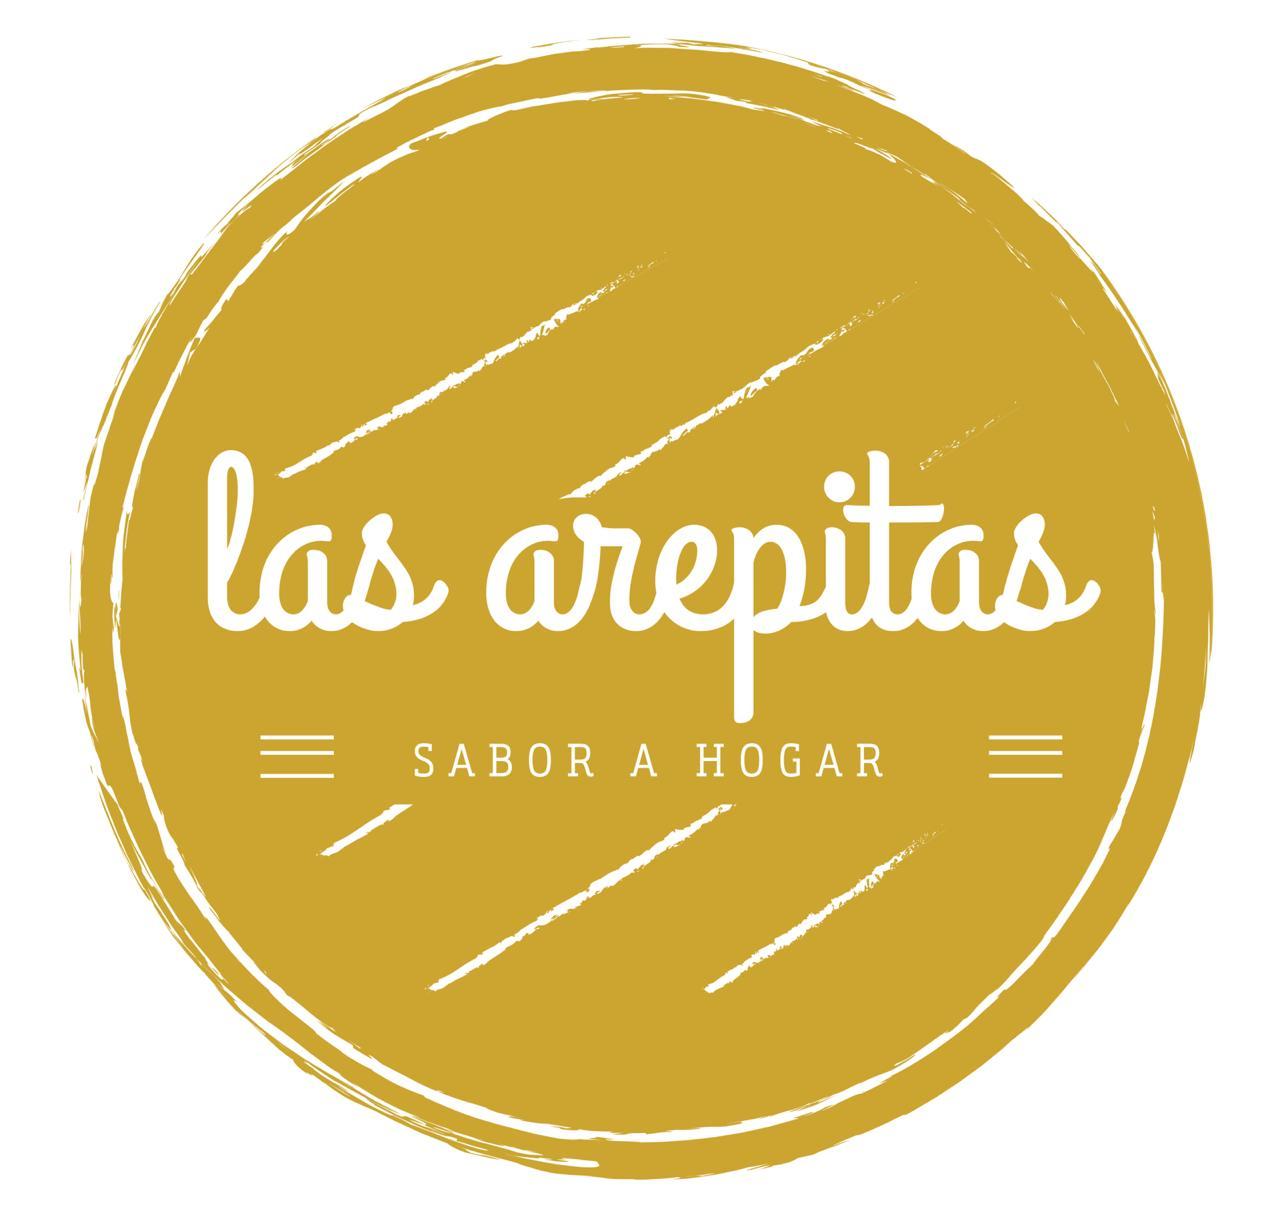 Las Arepitas Sabor a Hogar Laureles